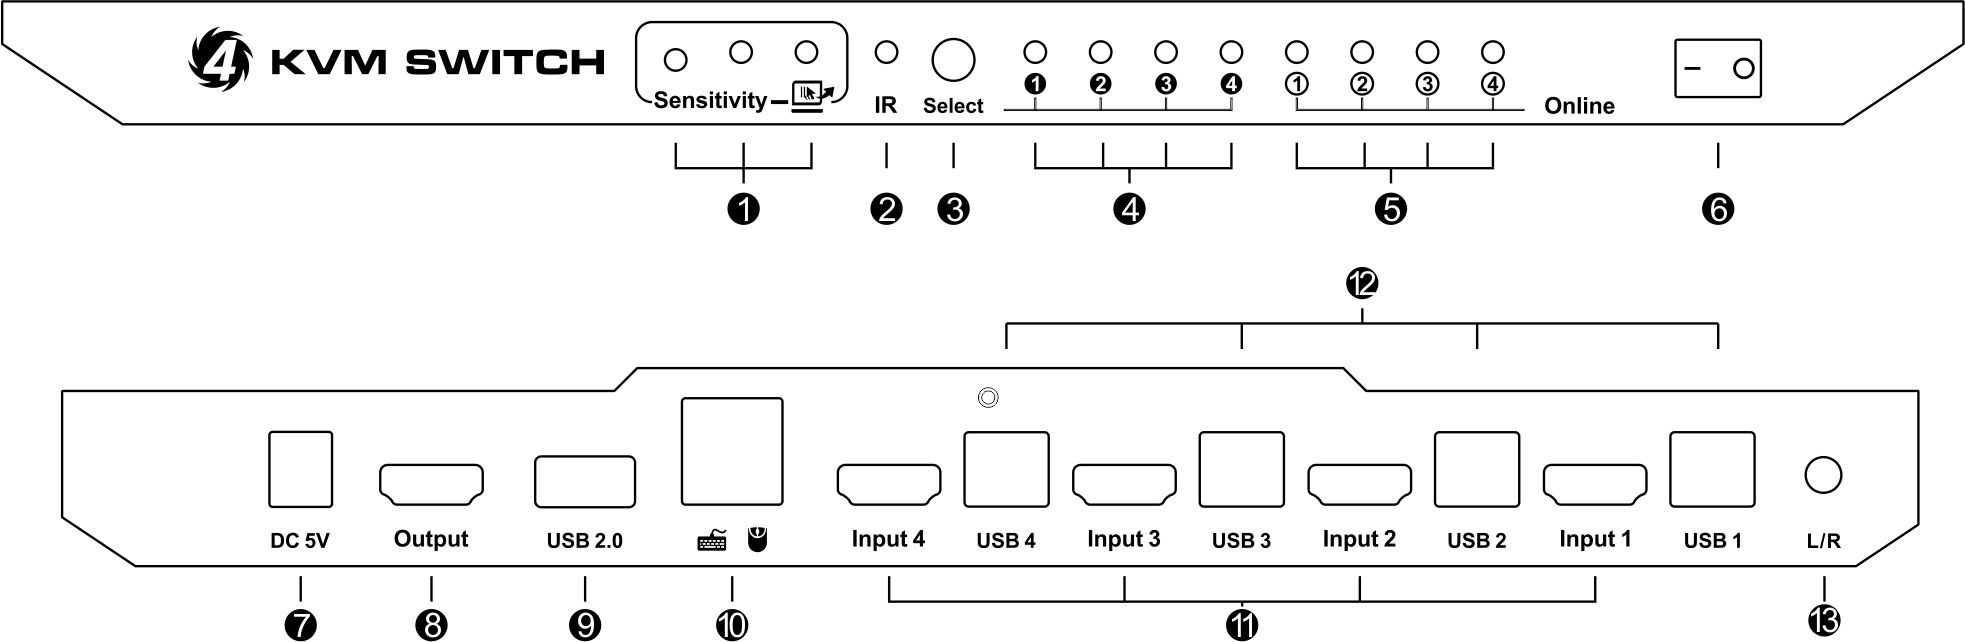 HKS0401-A20-PANAL-V1